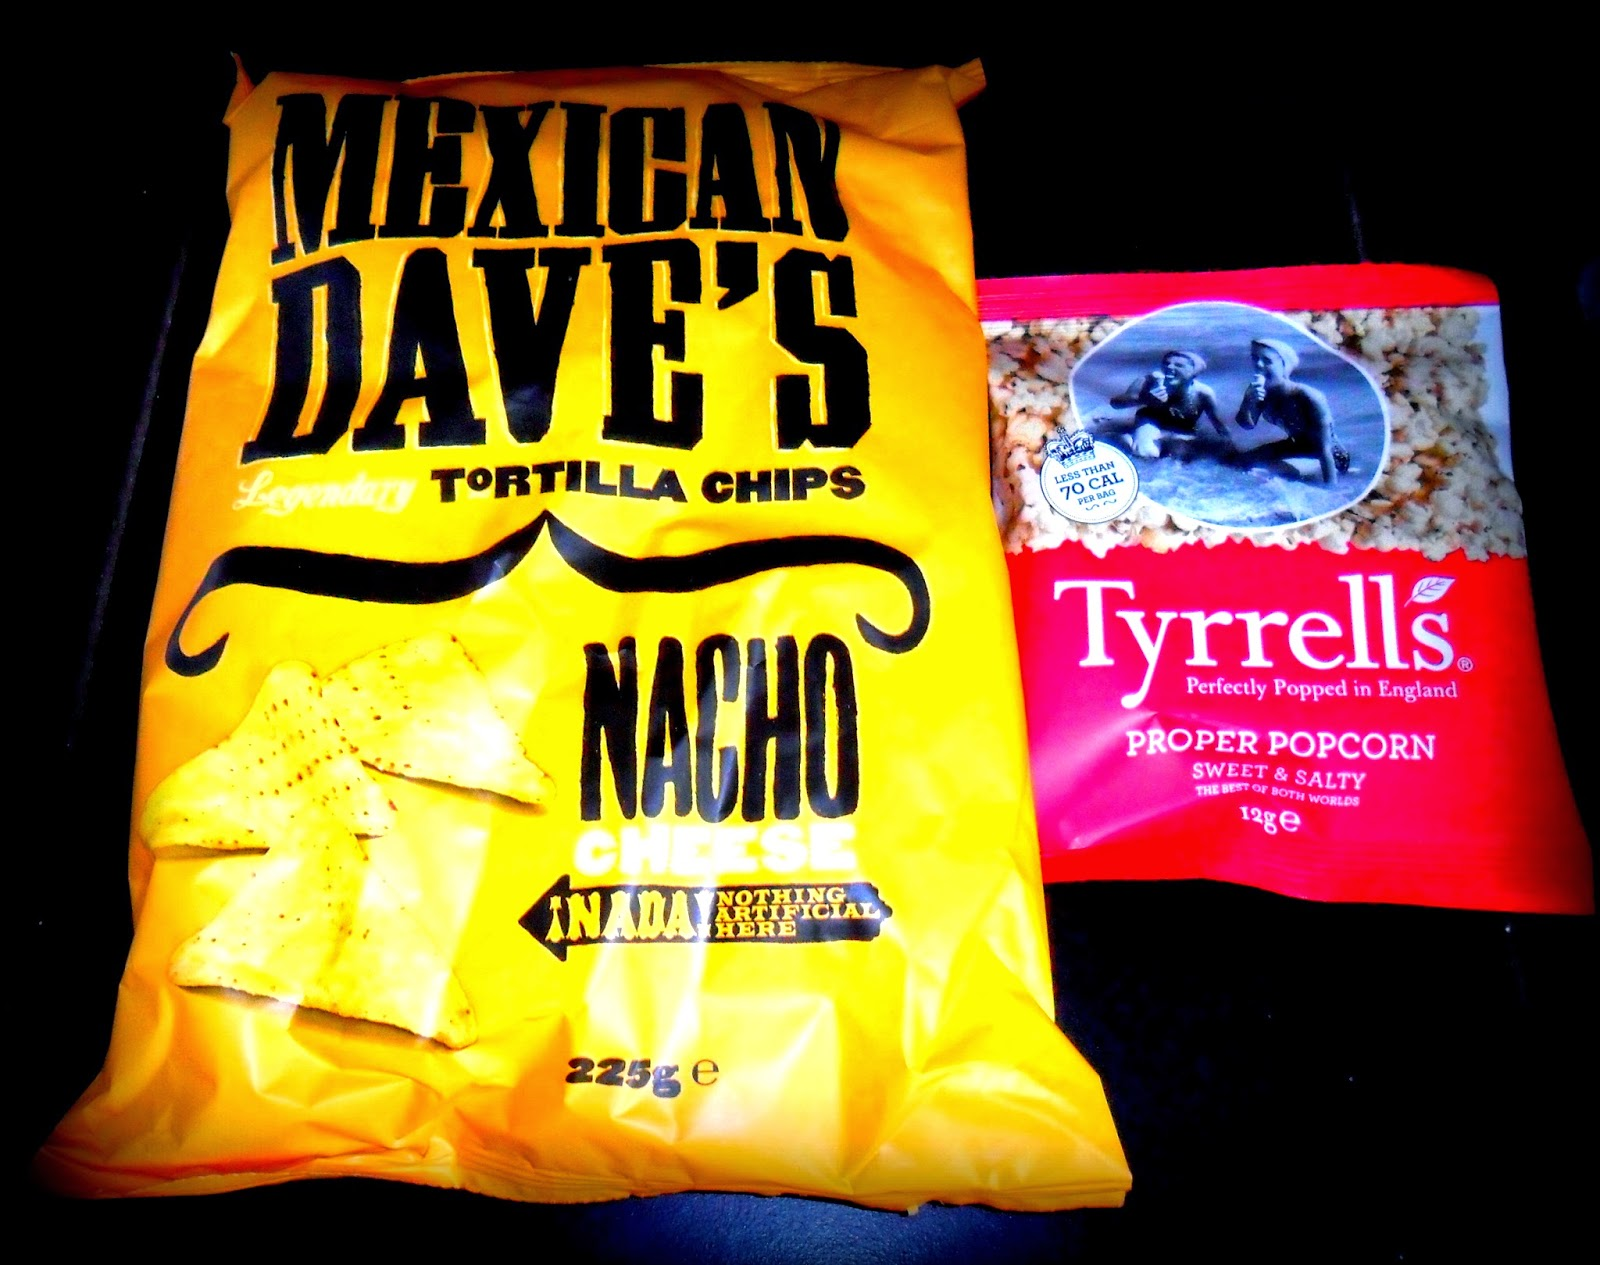 Mexican Dave's Cheesy Nacho's, Cheesy Nacho's, Nacho's, Tyrells, Popcorn, Snacks, Premium Snacks